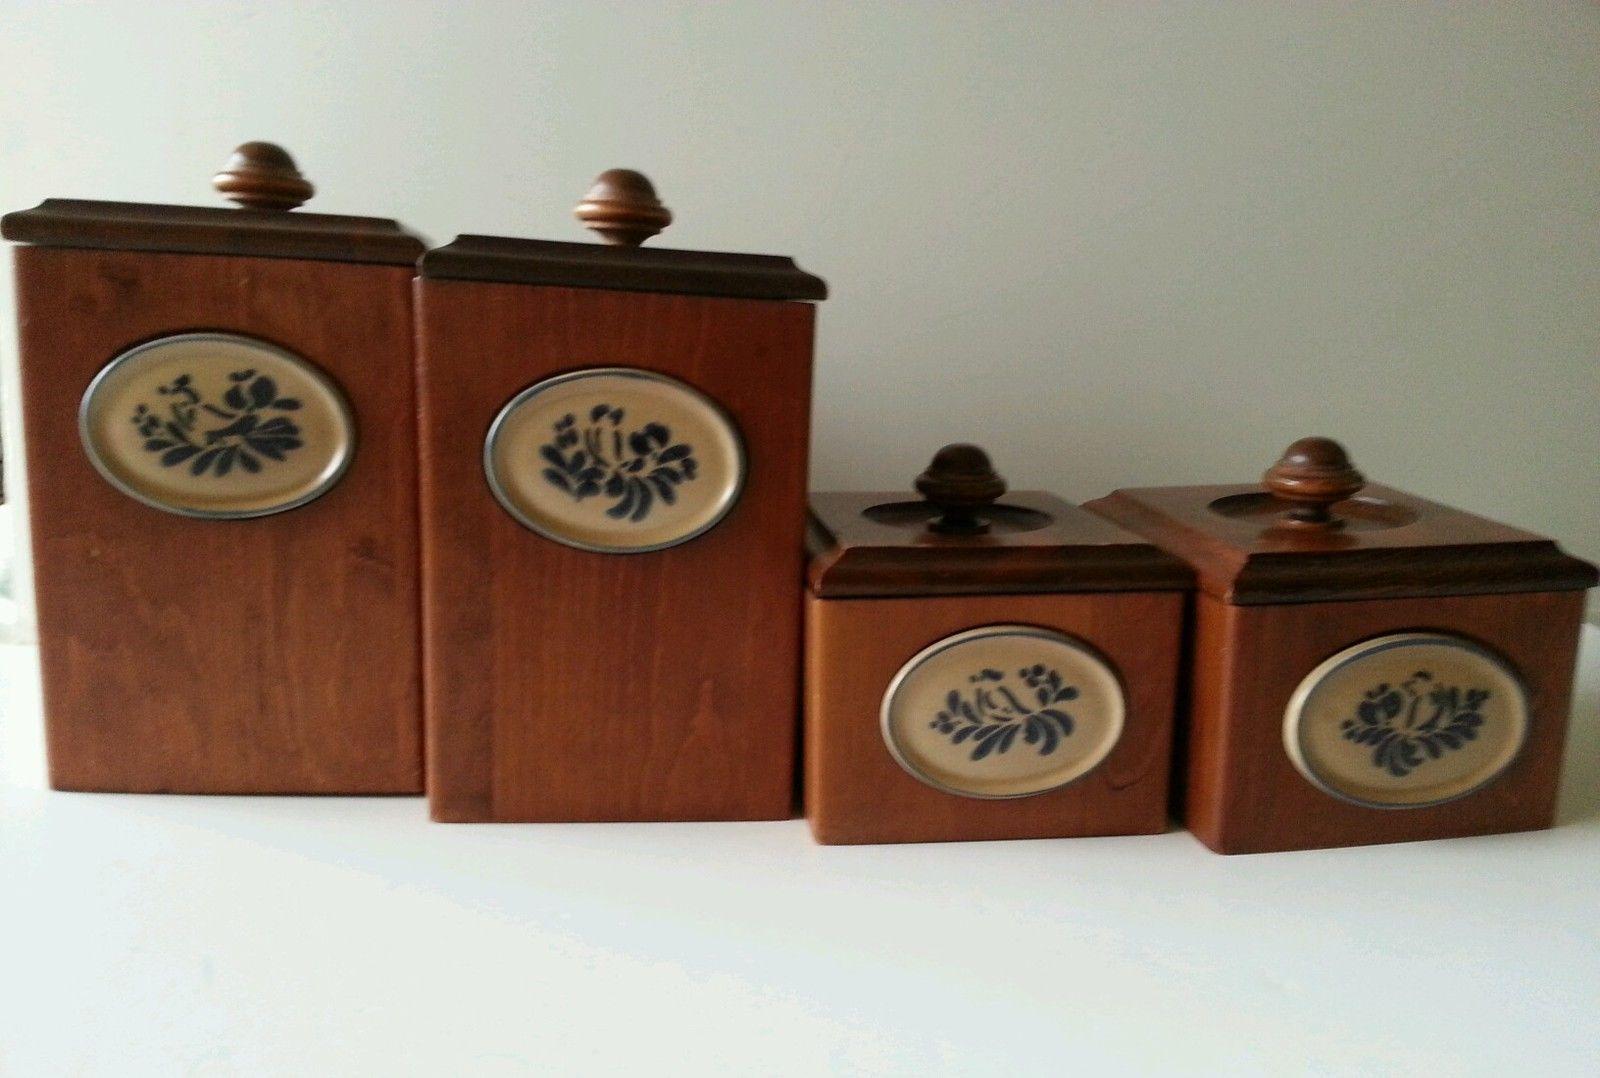 Four Piece Canister Set Vintage Set Of Four Slanted Glass Jars With Wood Tops In Wood Holder Cookie Jars Cookie Jars Vintage Glass Cookie Jars Glass Jars